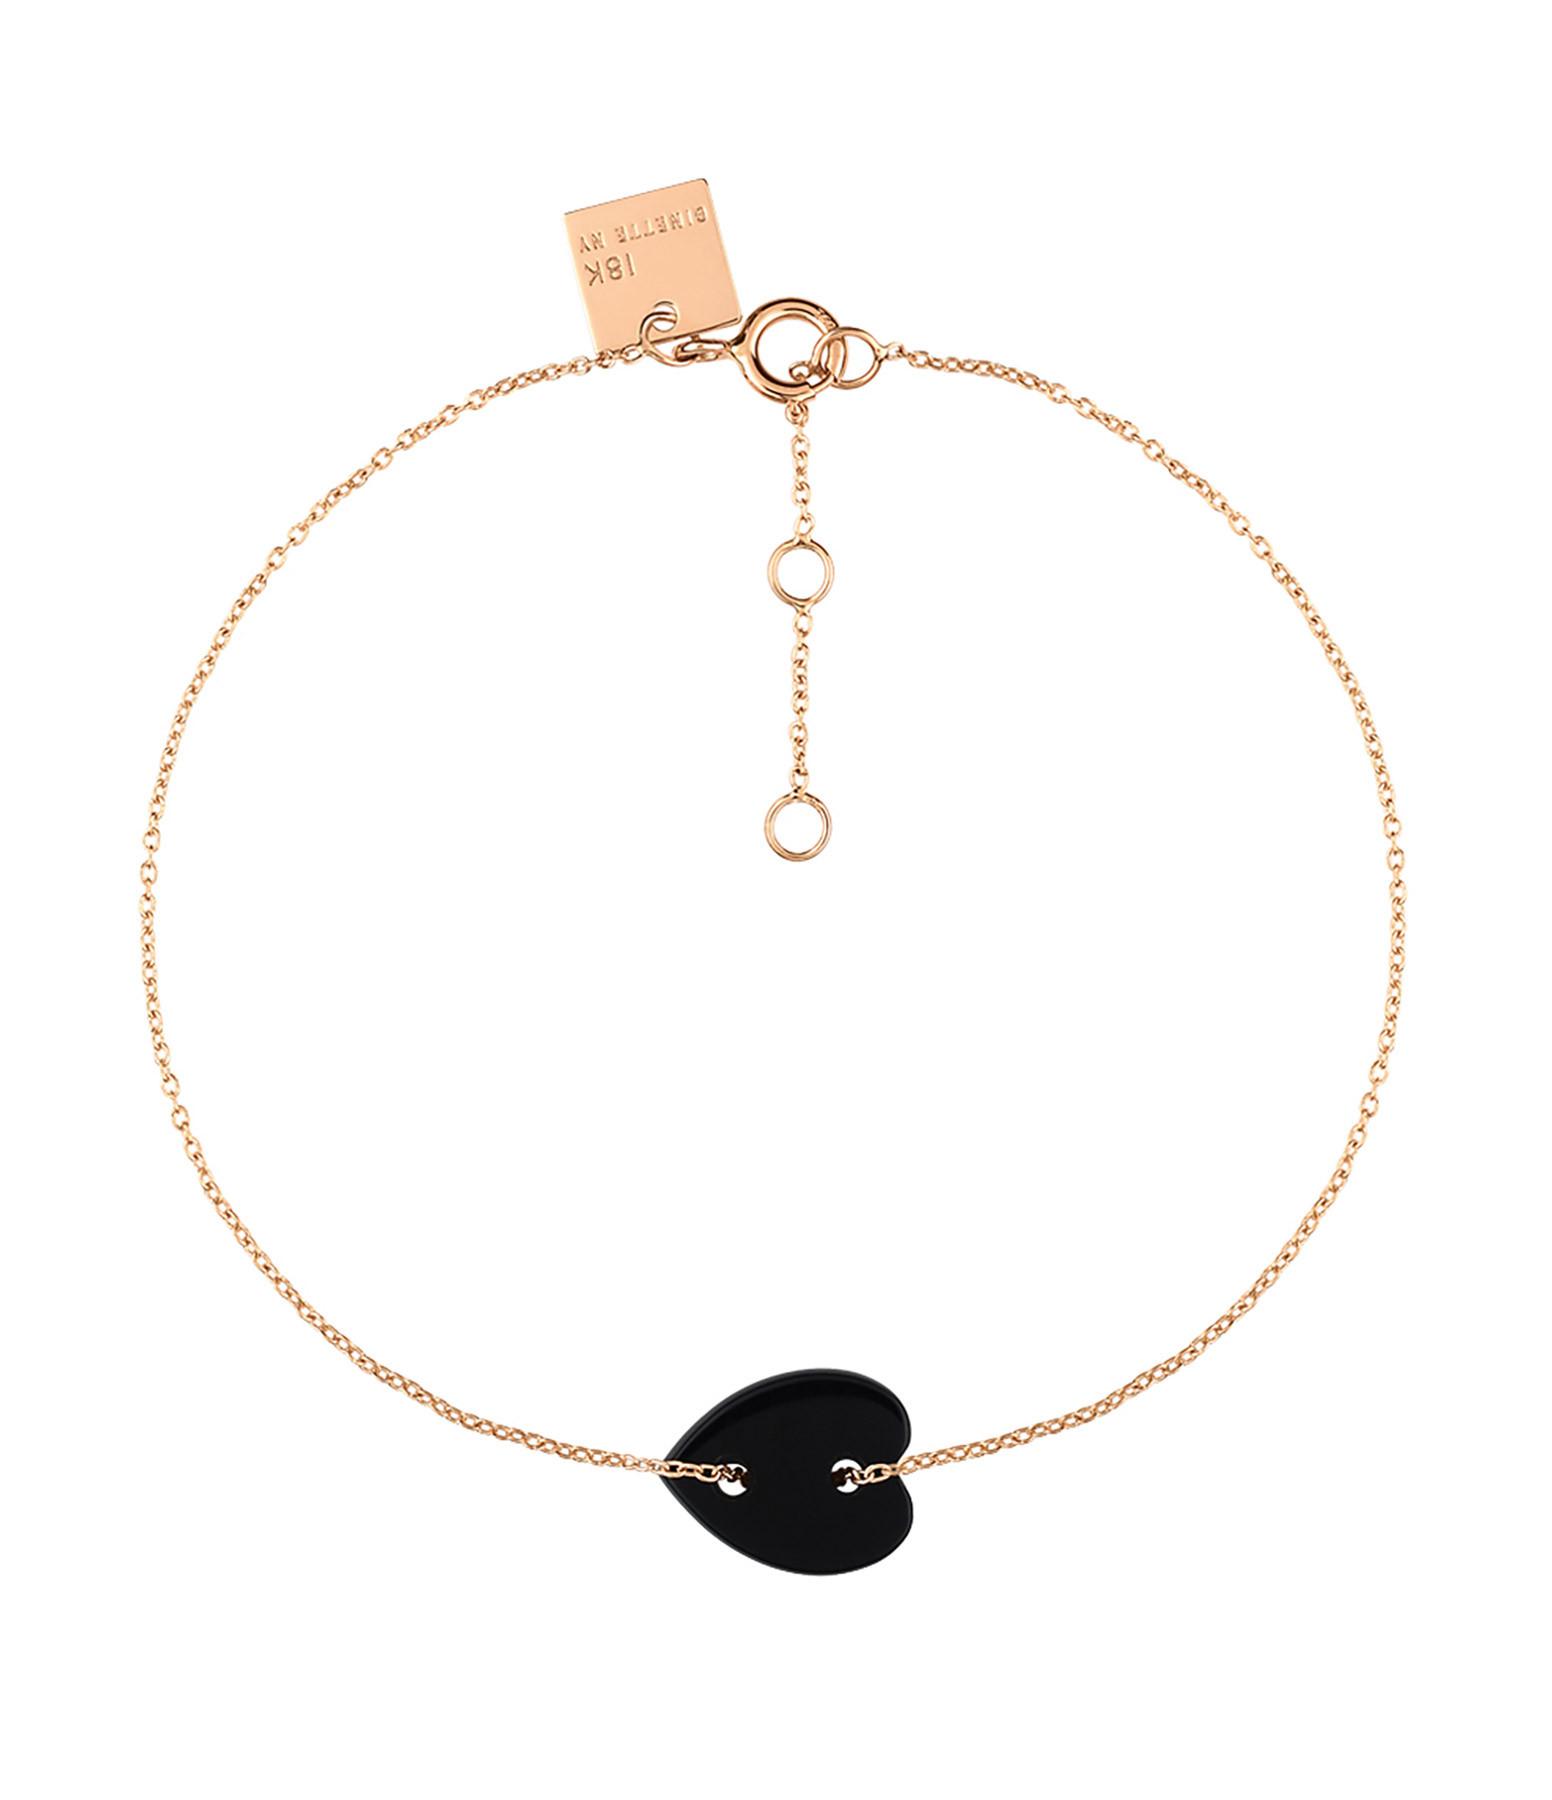 GINETTE_NY - Bracelet Angele Mini Coeur Onyx